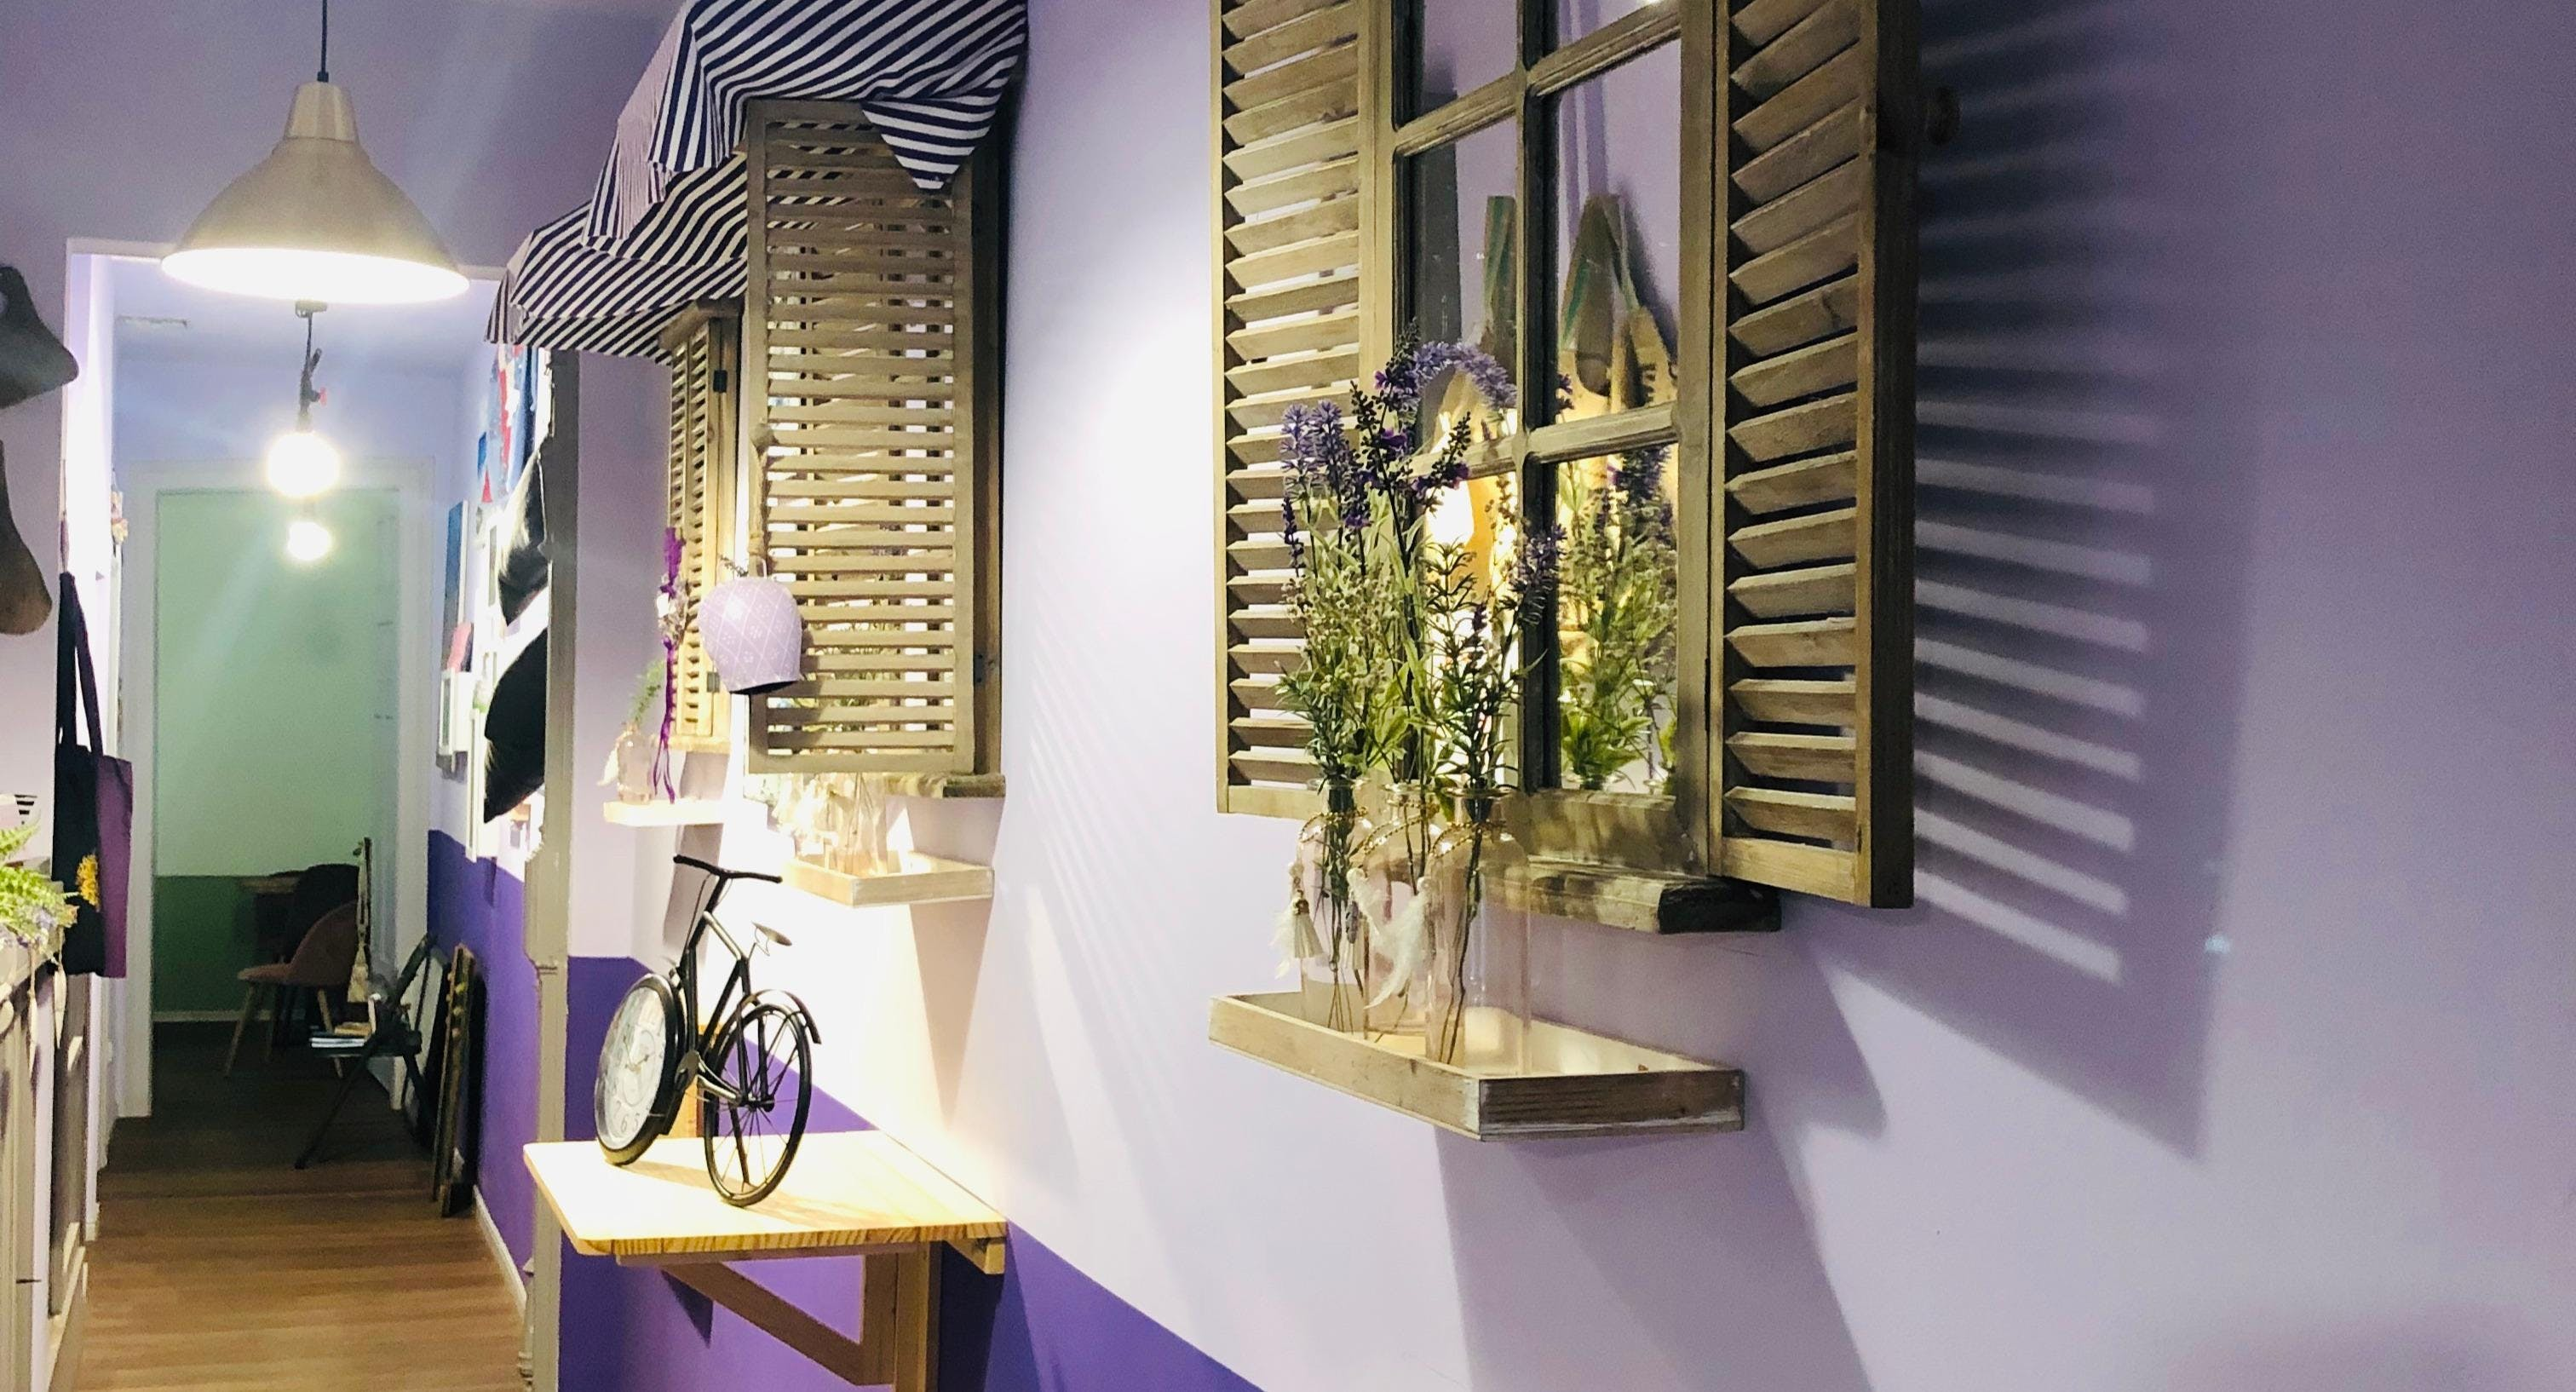 La Violetta Cafe Munich image 3